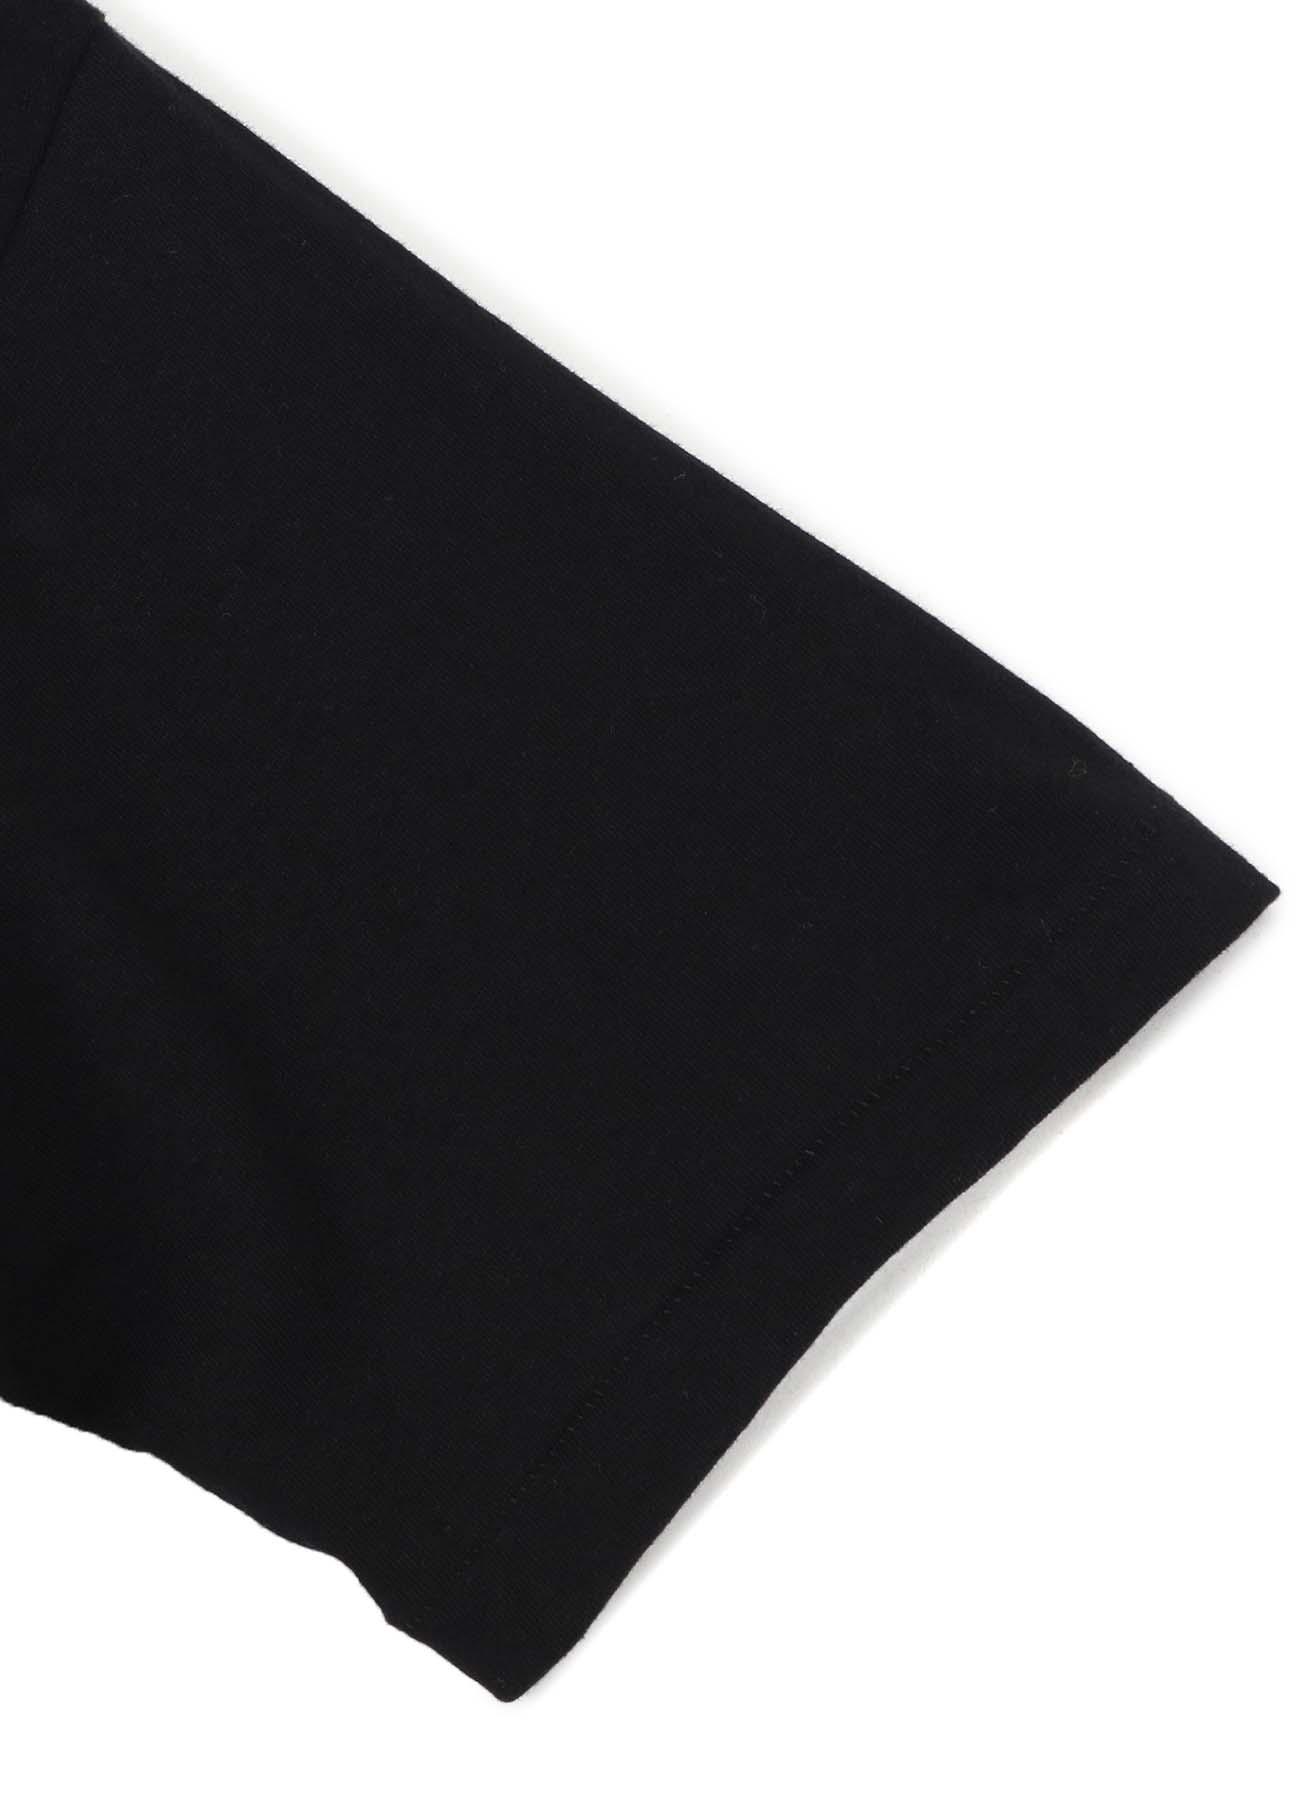 [THE SHOP Limited Product] 20/-Plain Stitch AL Print T-Shirt B